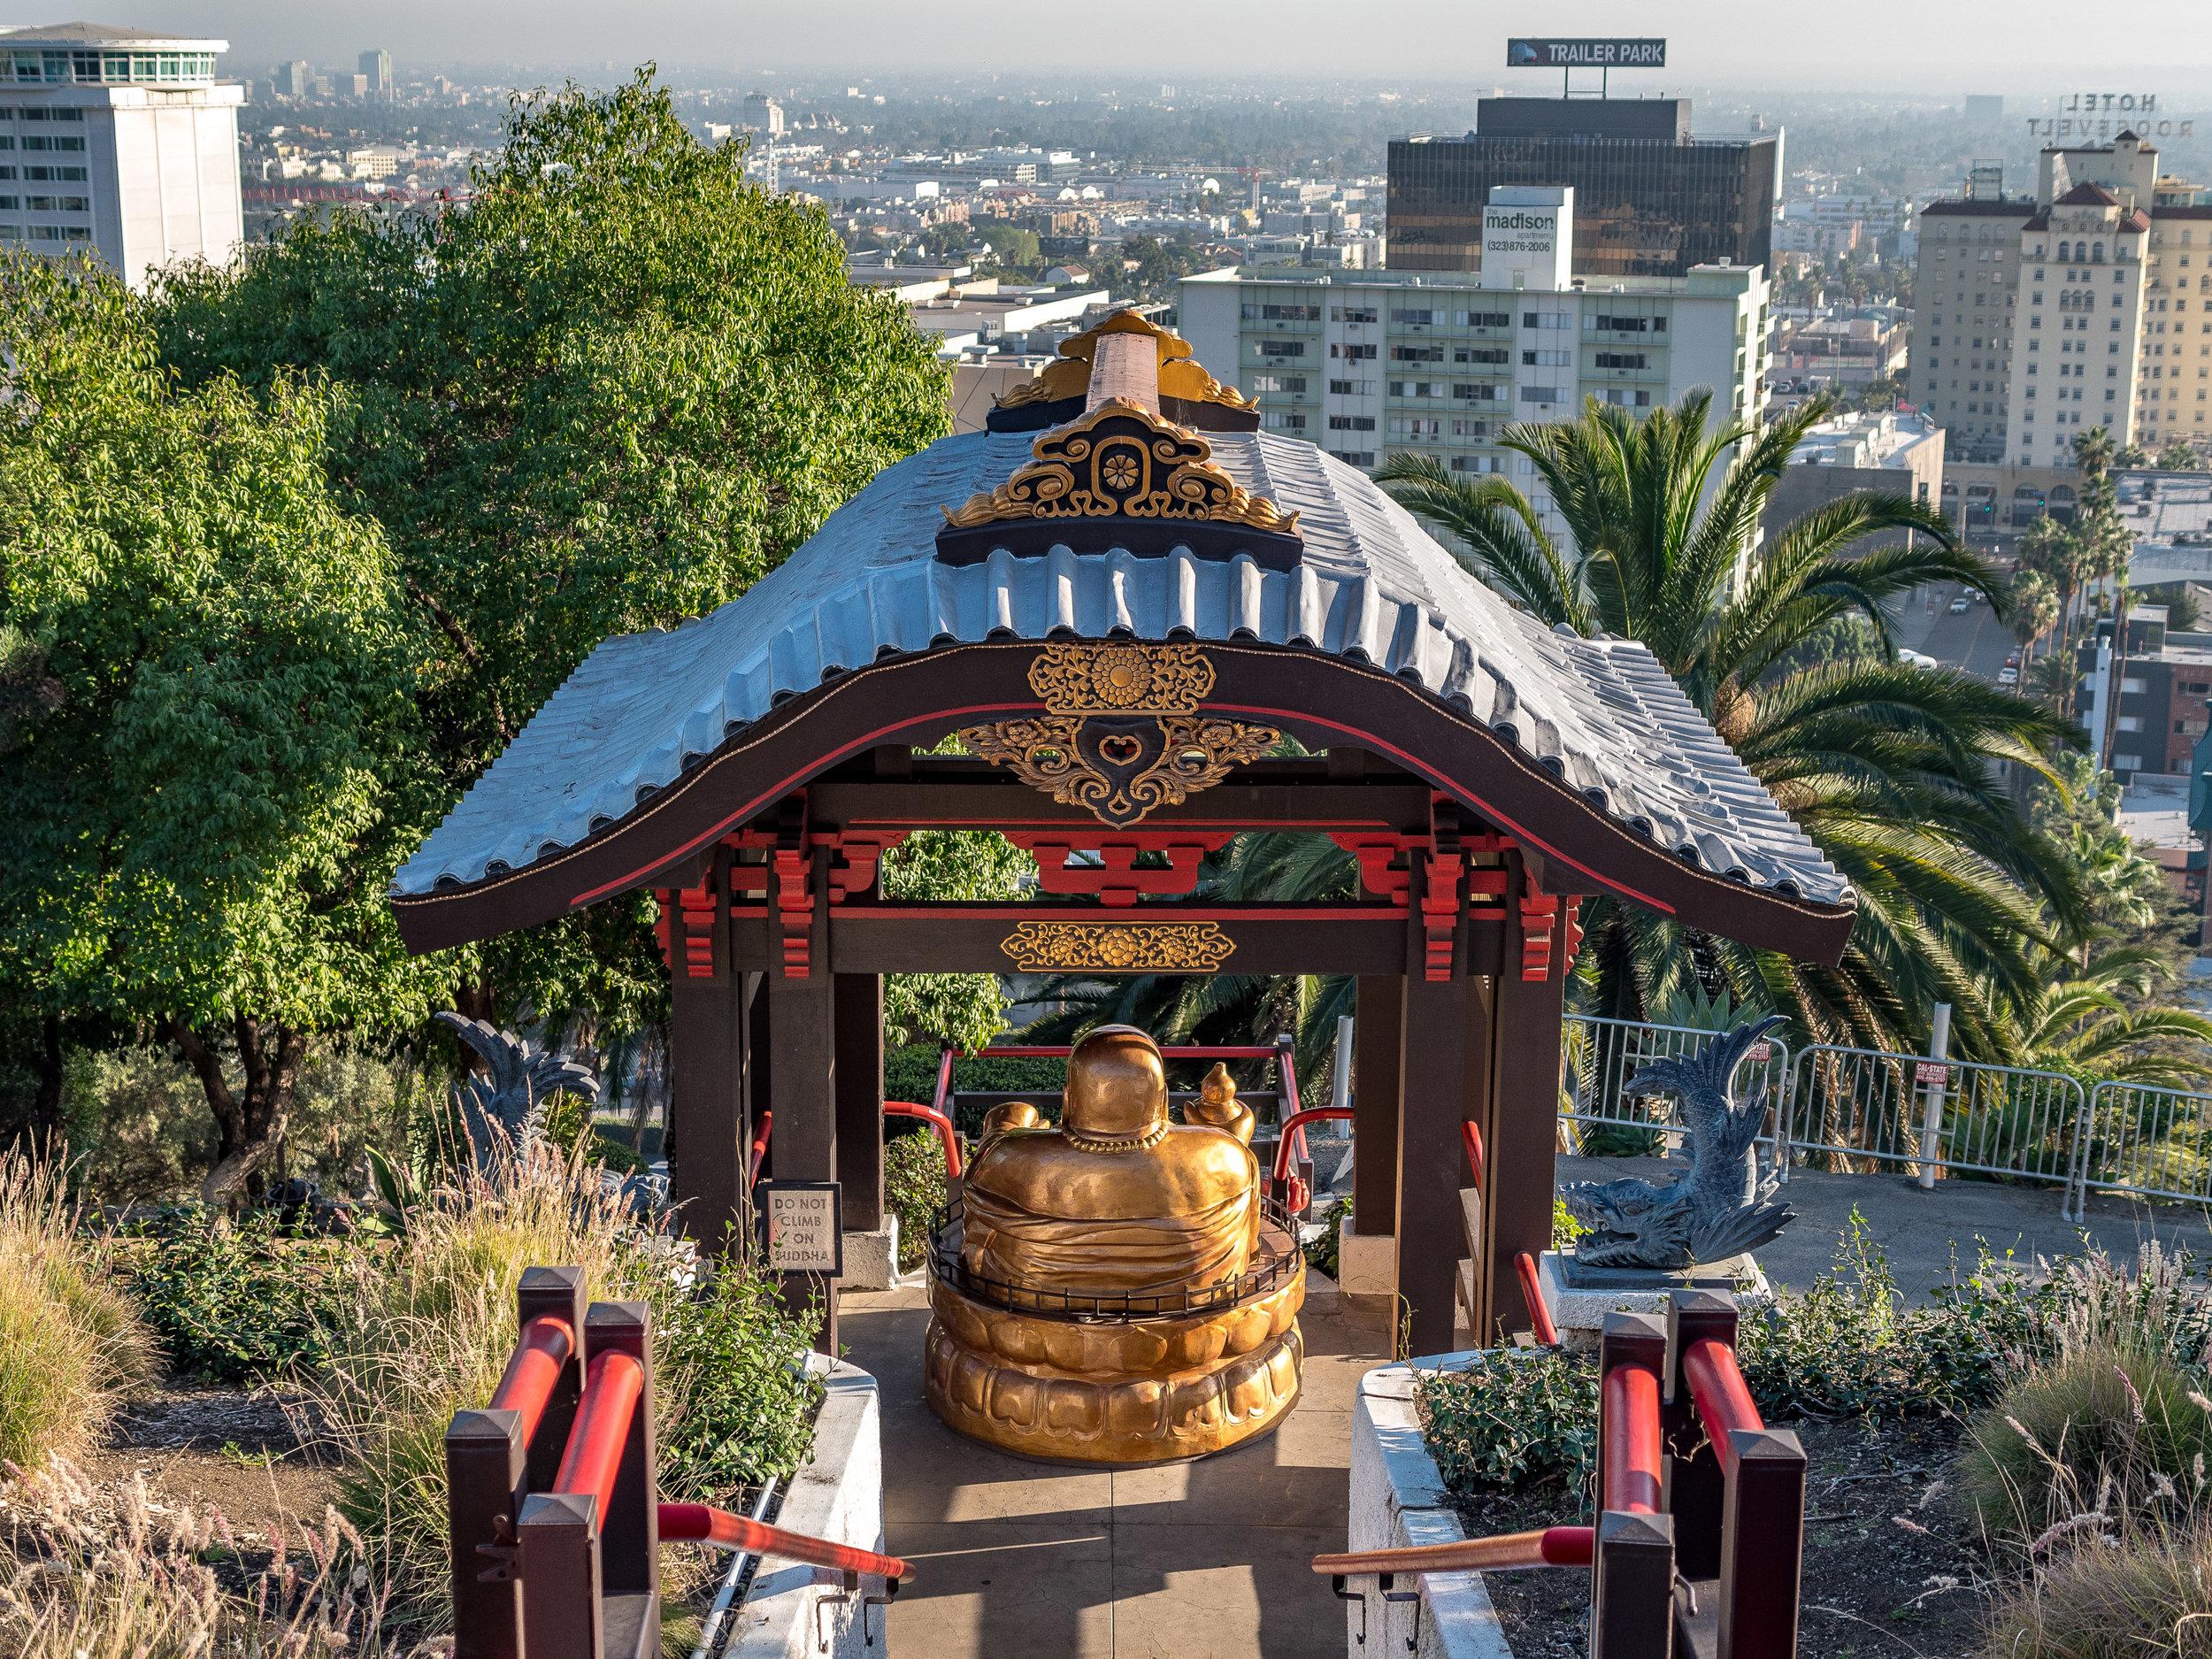 MYBELONGING-YAMASHIRO-HOLLYWOOD-HILLS-LOS-ANGELES-CITY-GUIDE-PHOTOGRAPHY-9.jpg